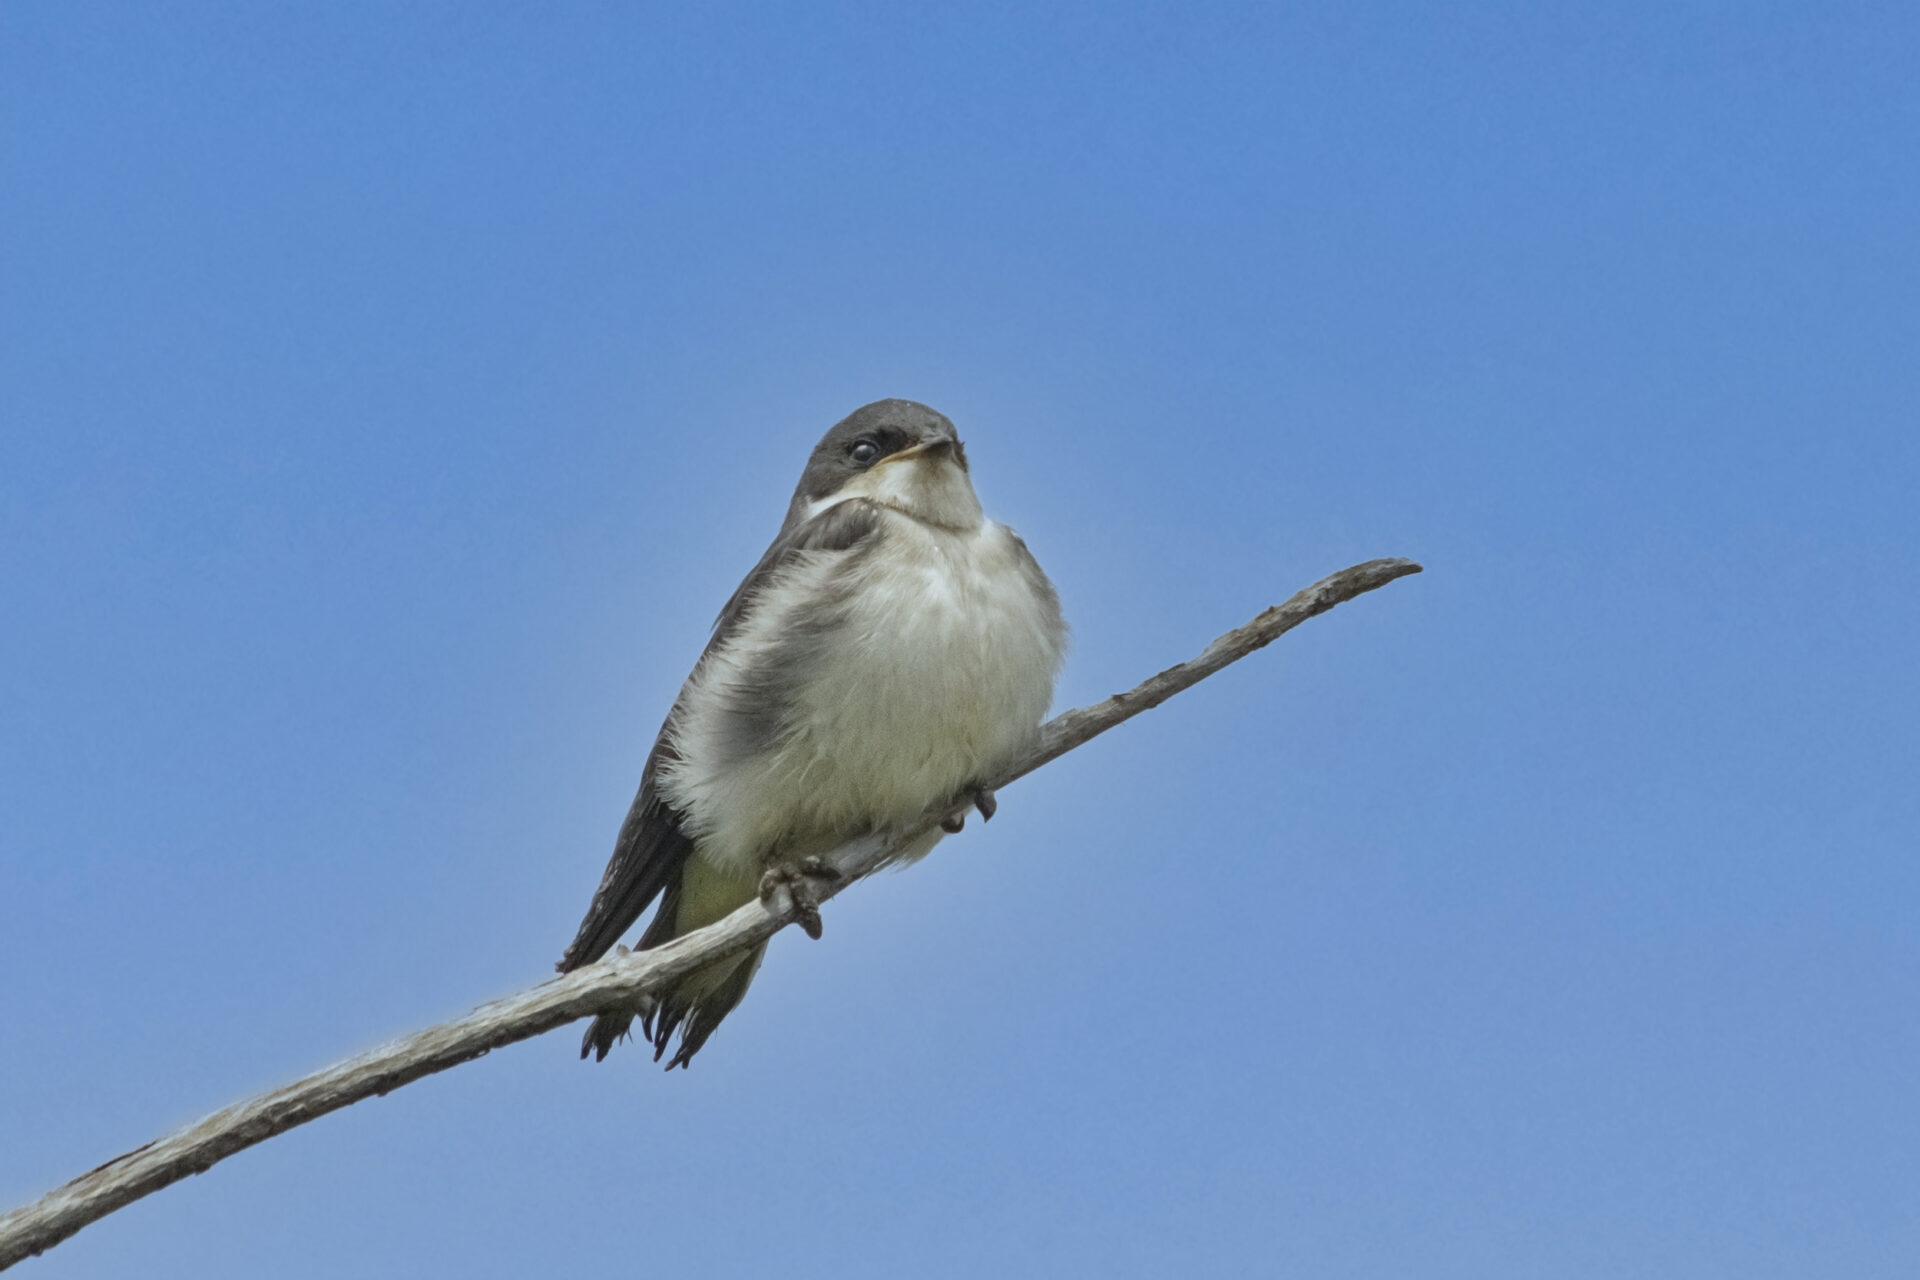 Juvenile Tree Swallow, June 19 2021